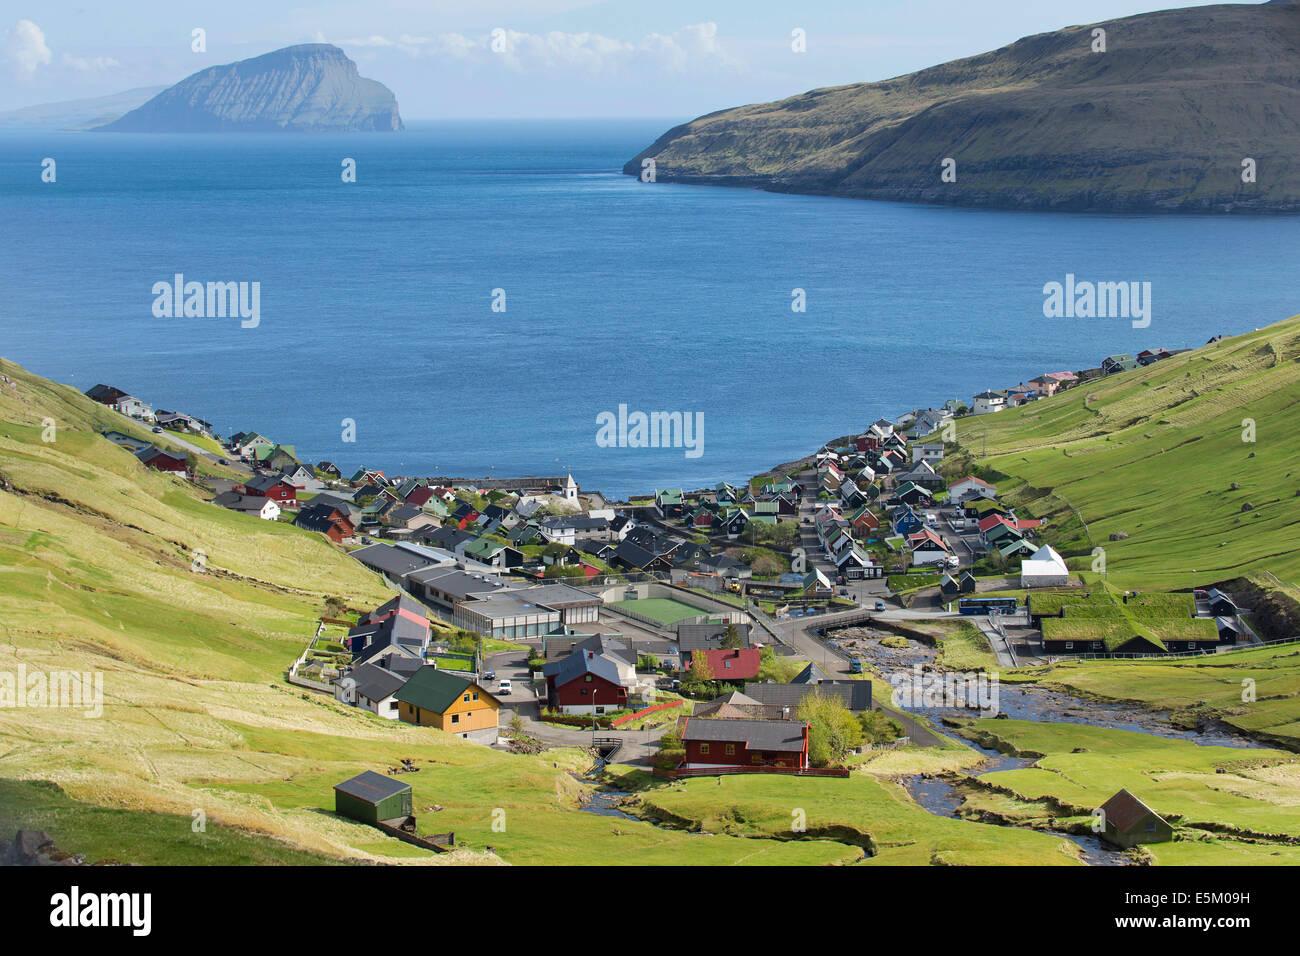 Vue du village de Kvívík, Streymoy, îles Féroé, Danemark Photo Stock